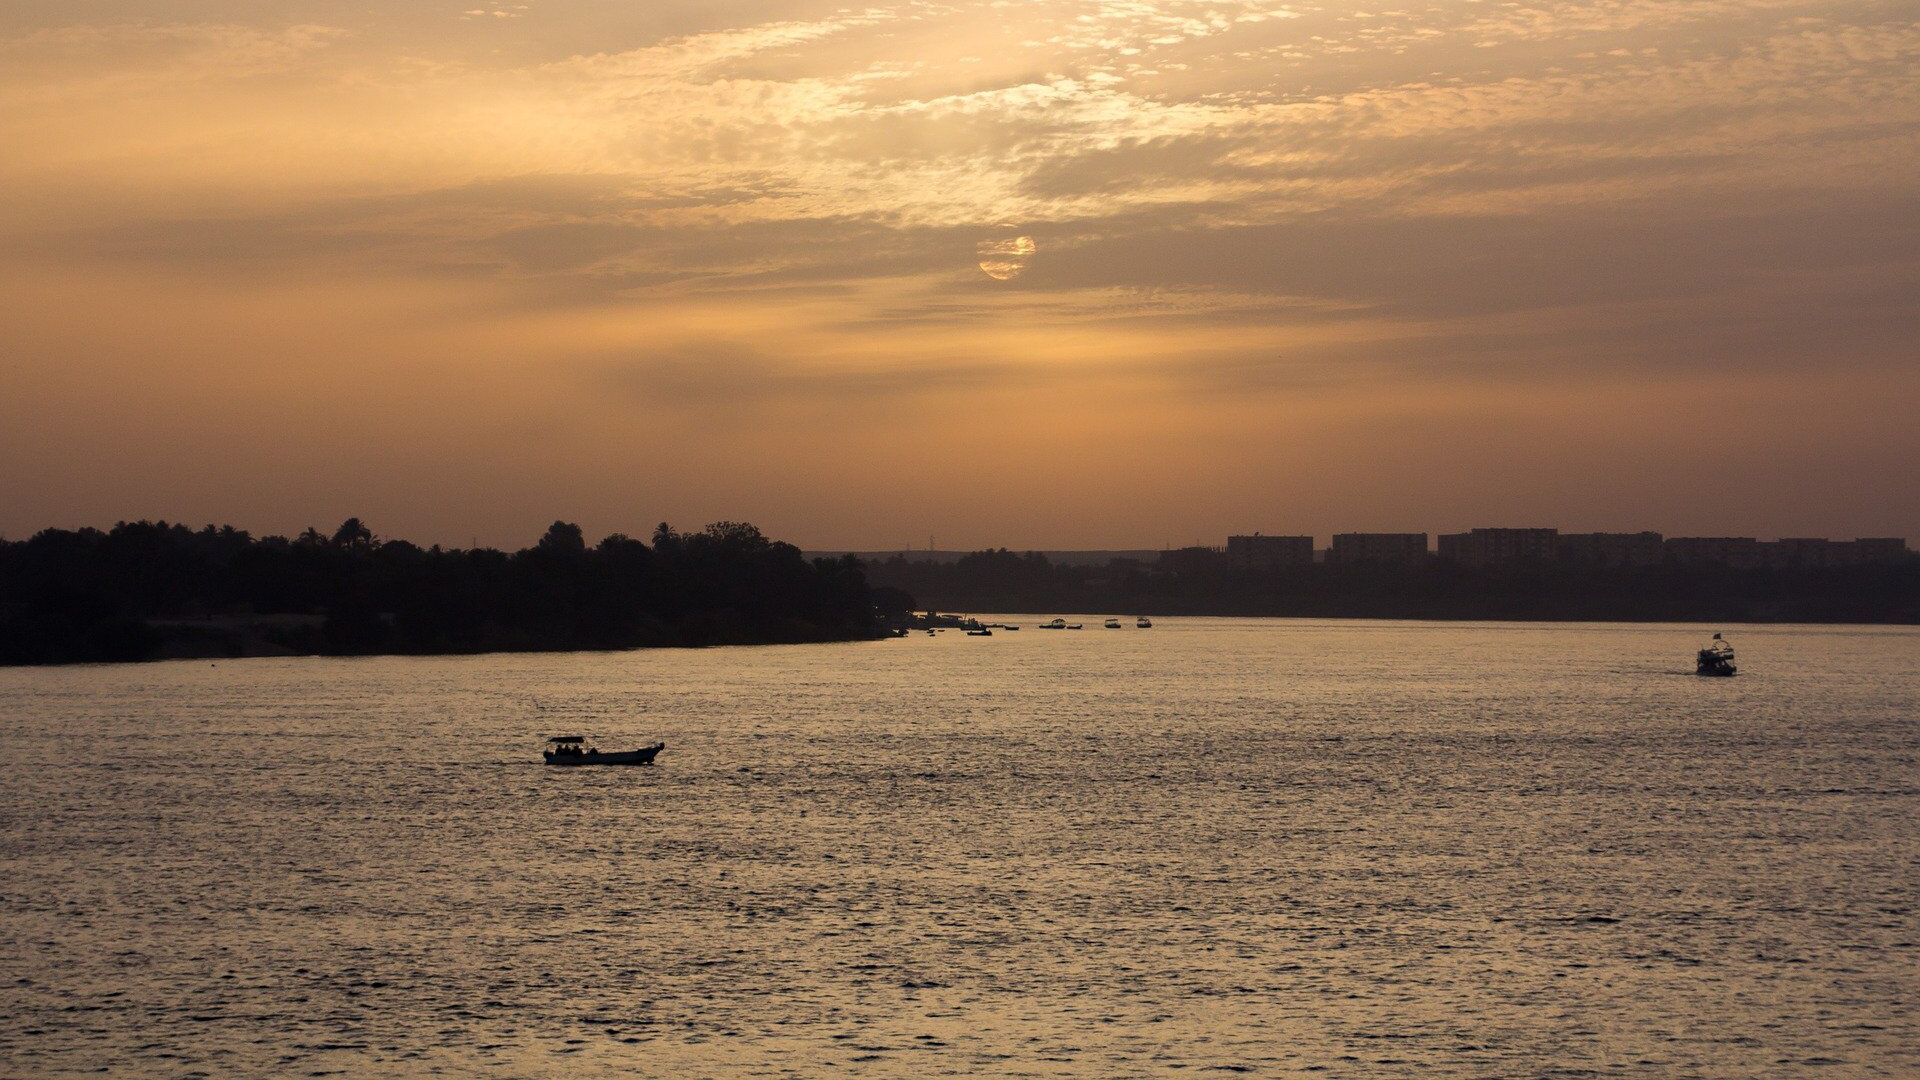 El río Nilo (archivo) - Sputnik Mundo, 1920, 16.04.2021